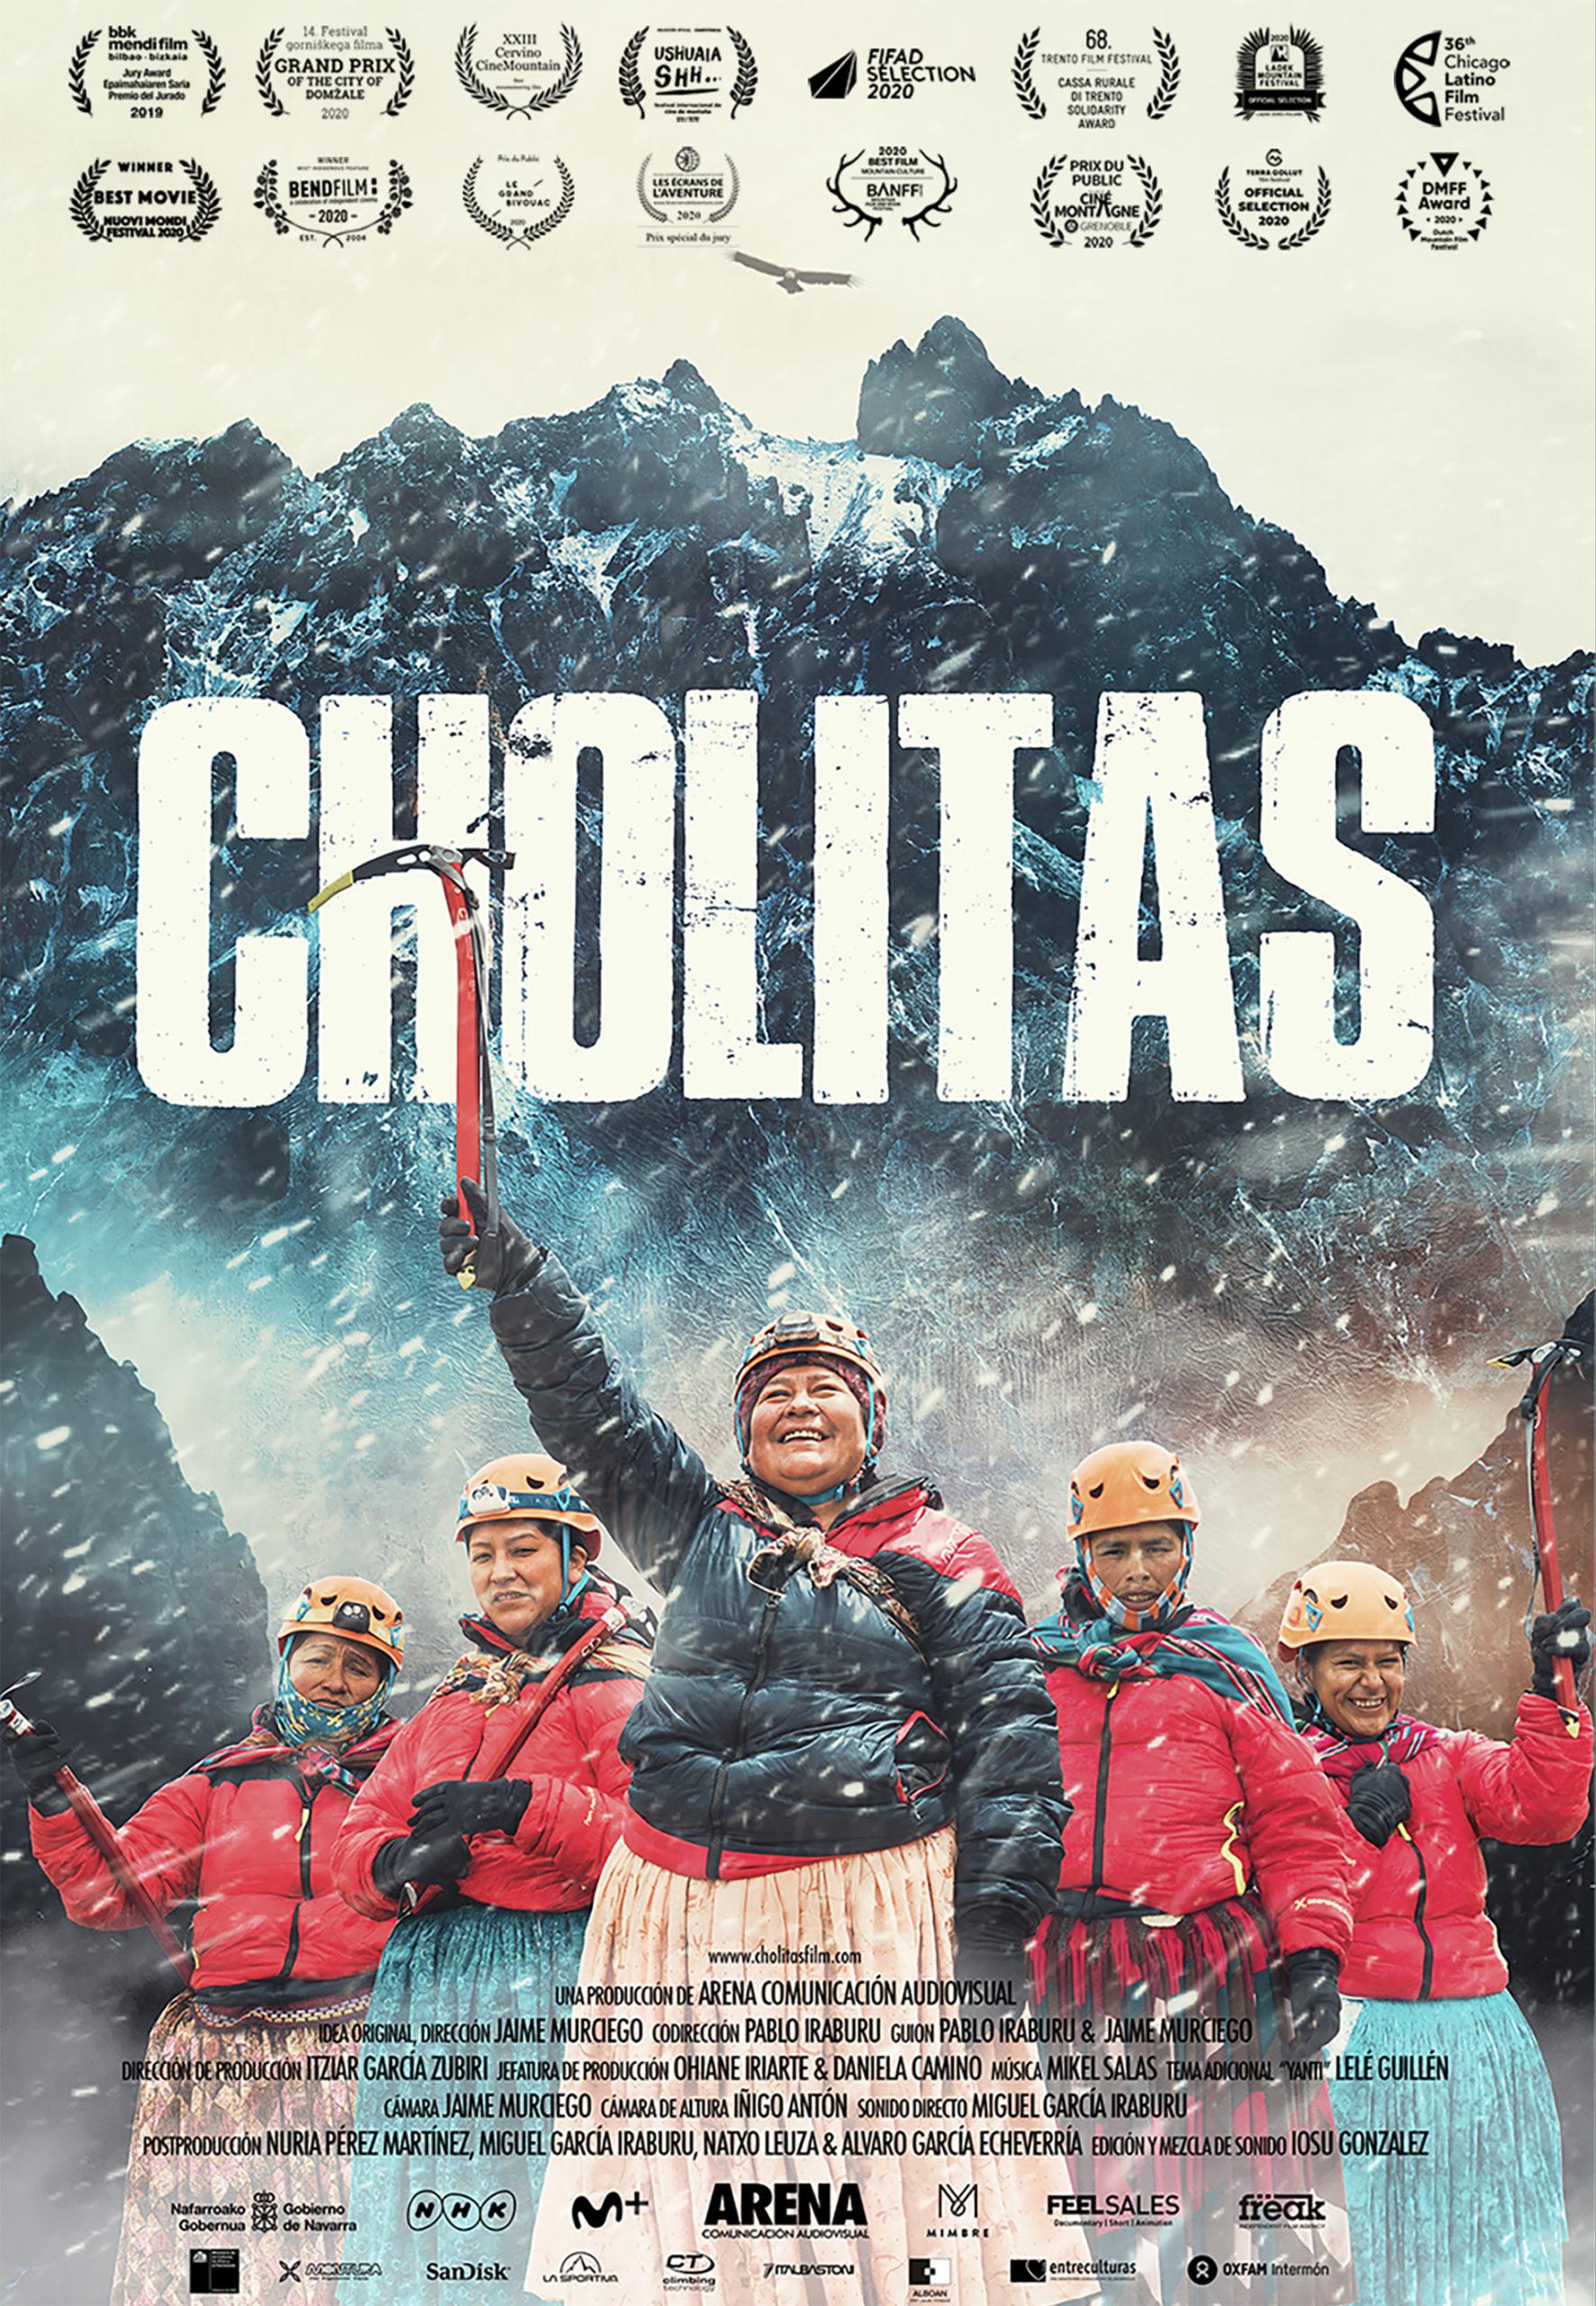 CHOLITAS_poster-laureles-temporal_20201112-scaled